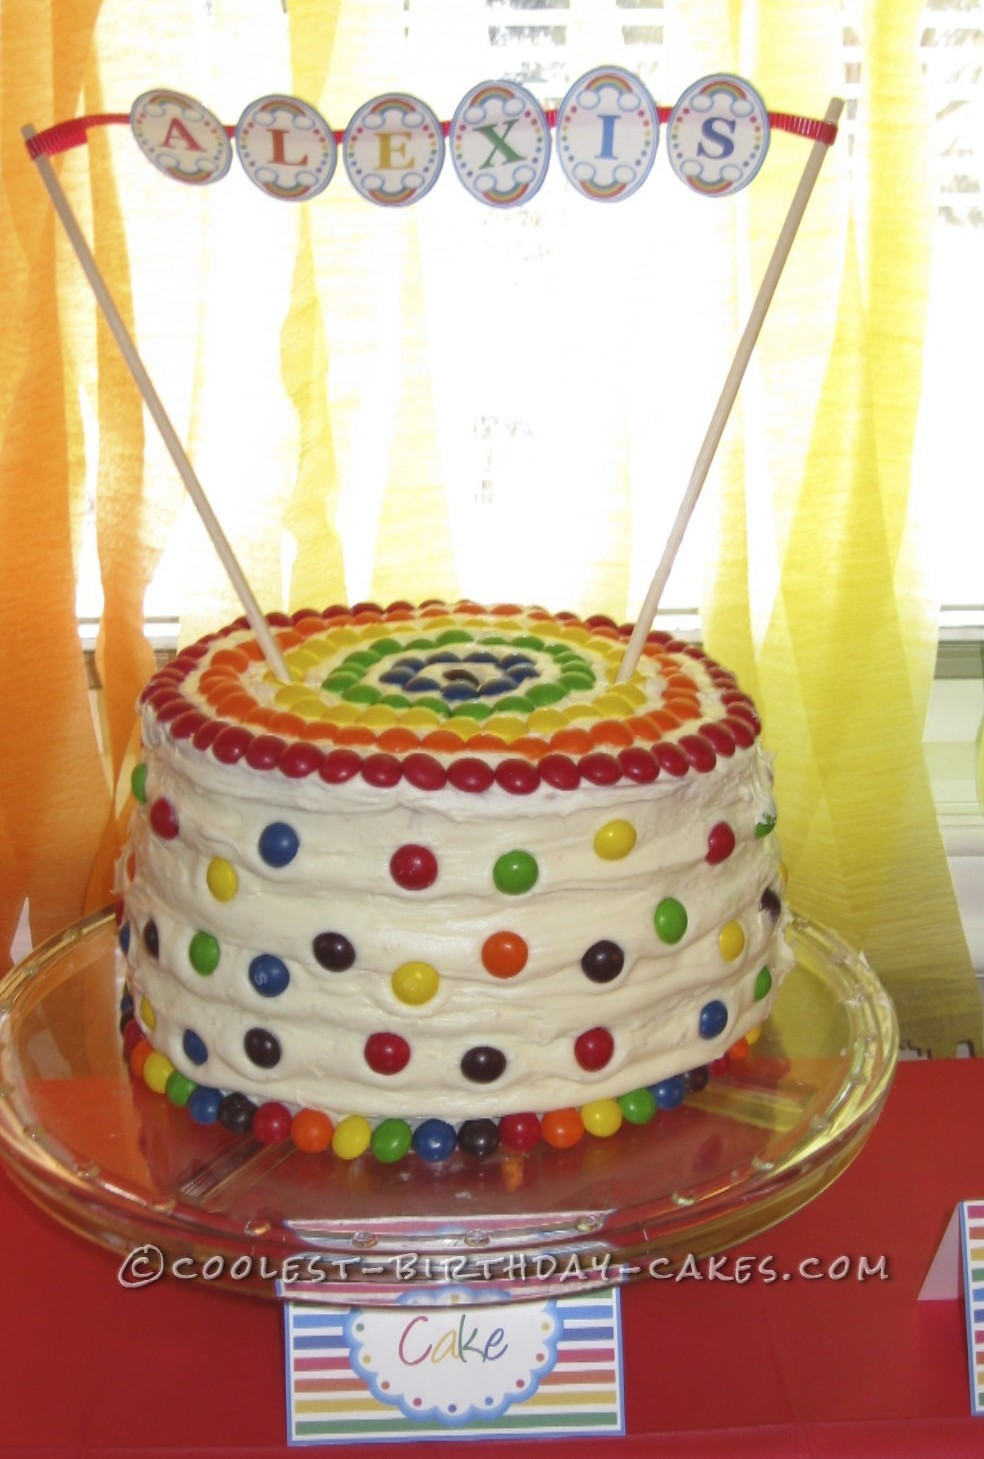 Coolest Rainbow Birthday Cake